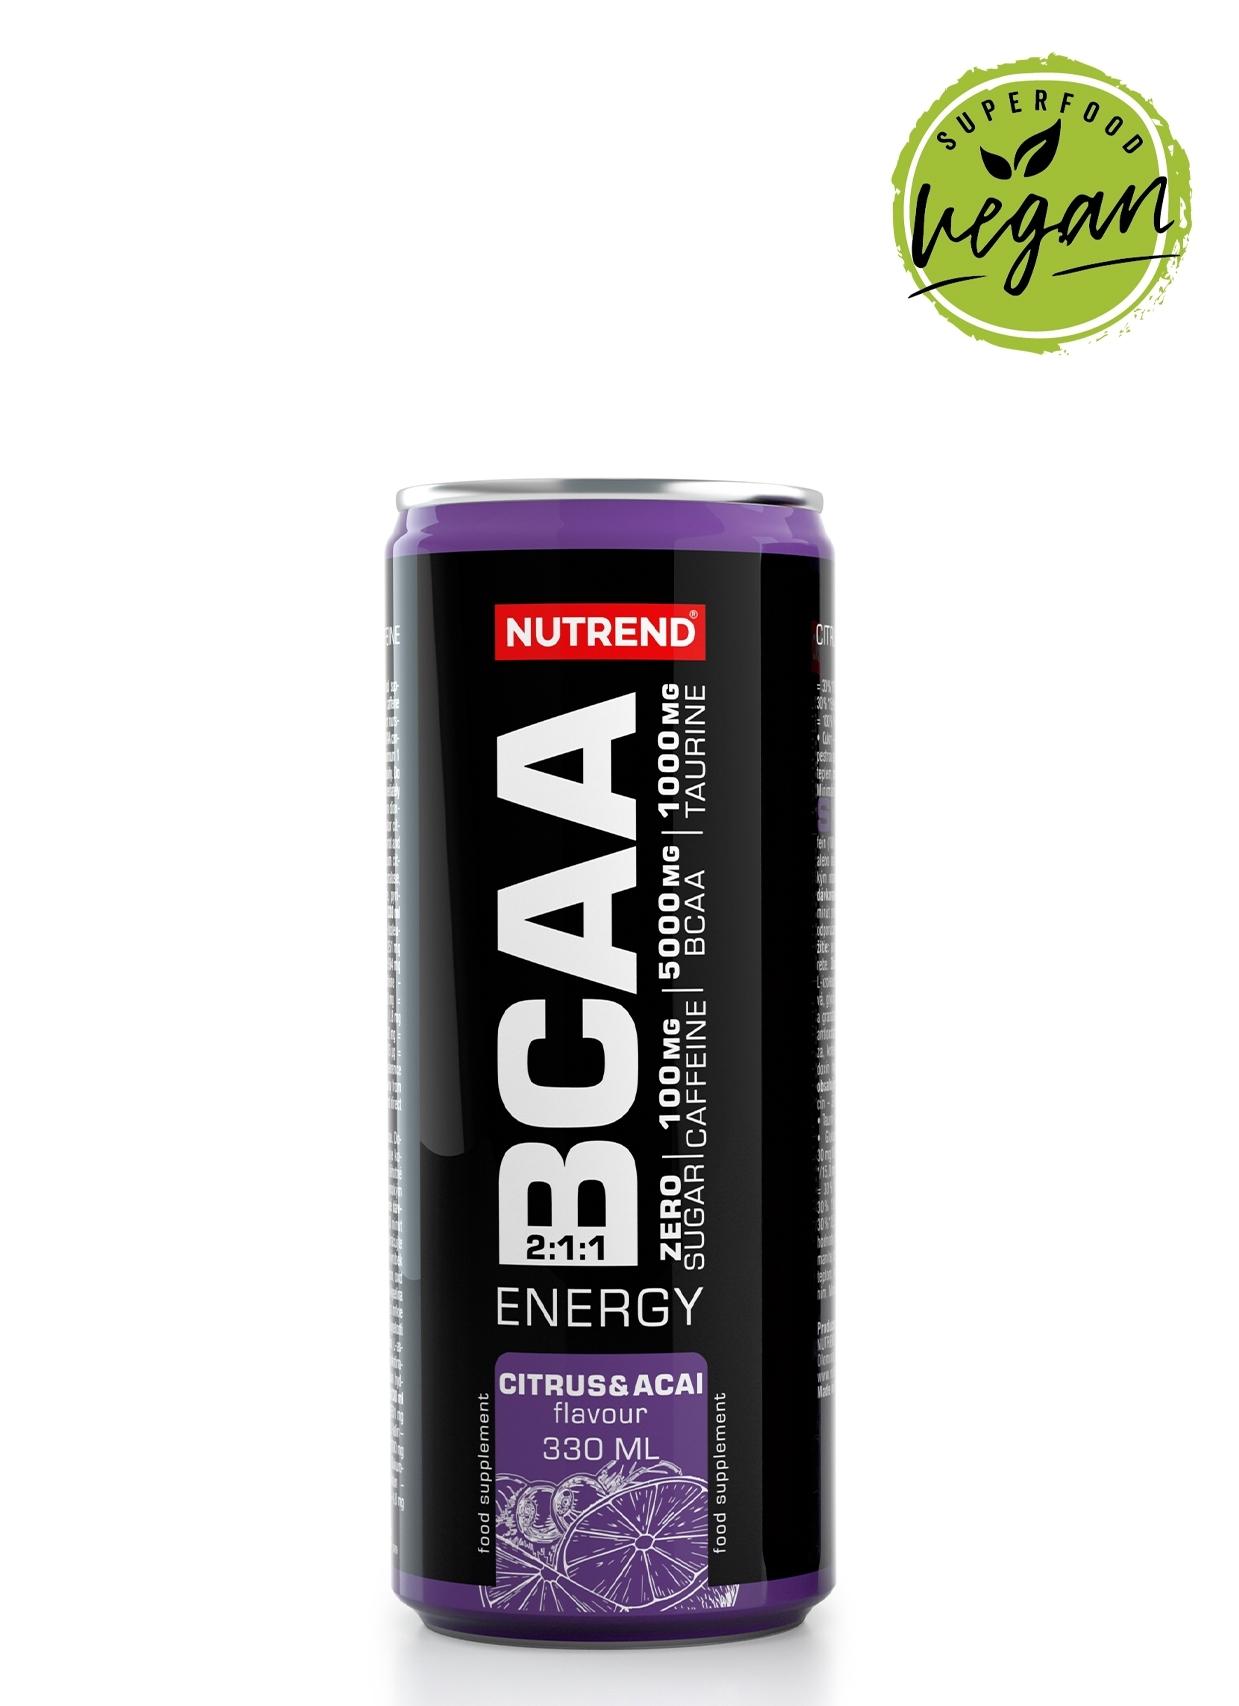 BCAA Energy, plechovka 330 ml, citrus a acai